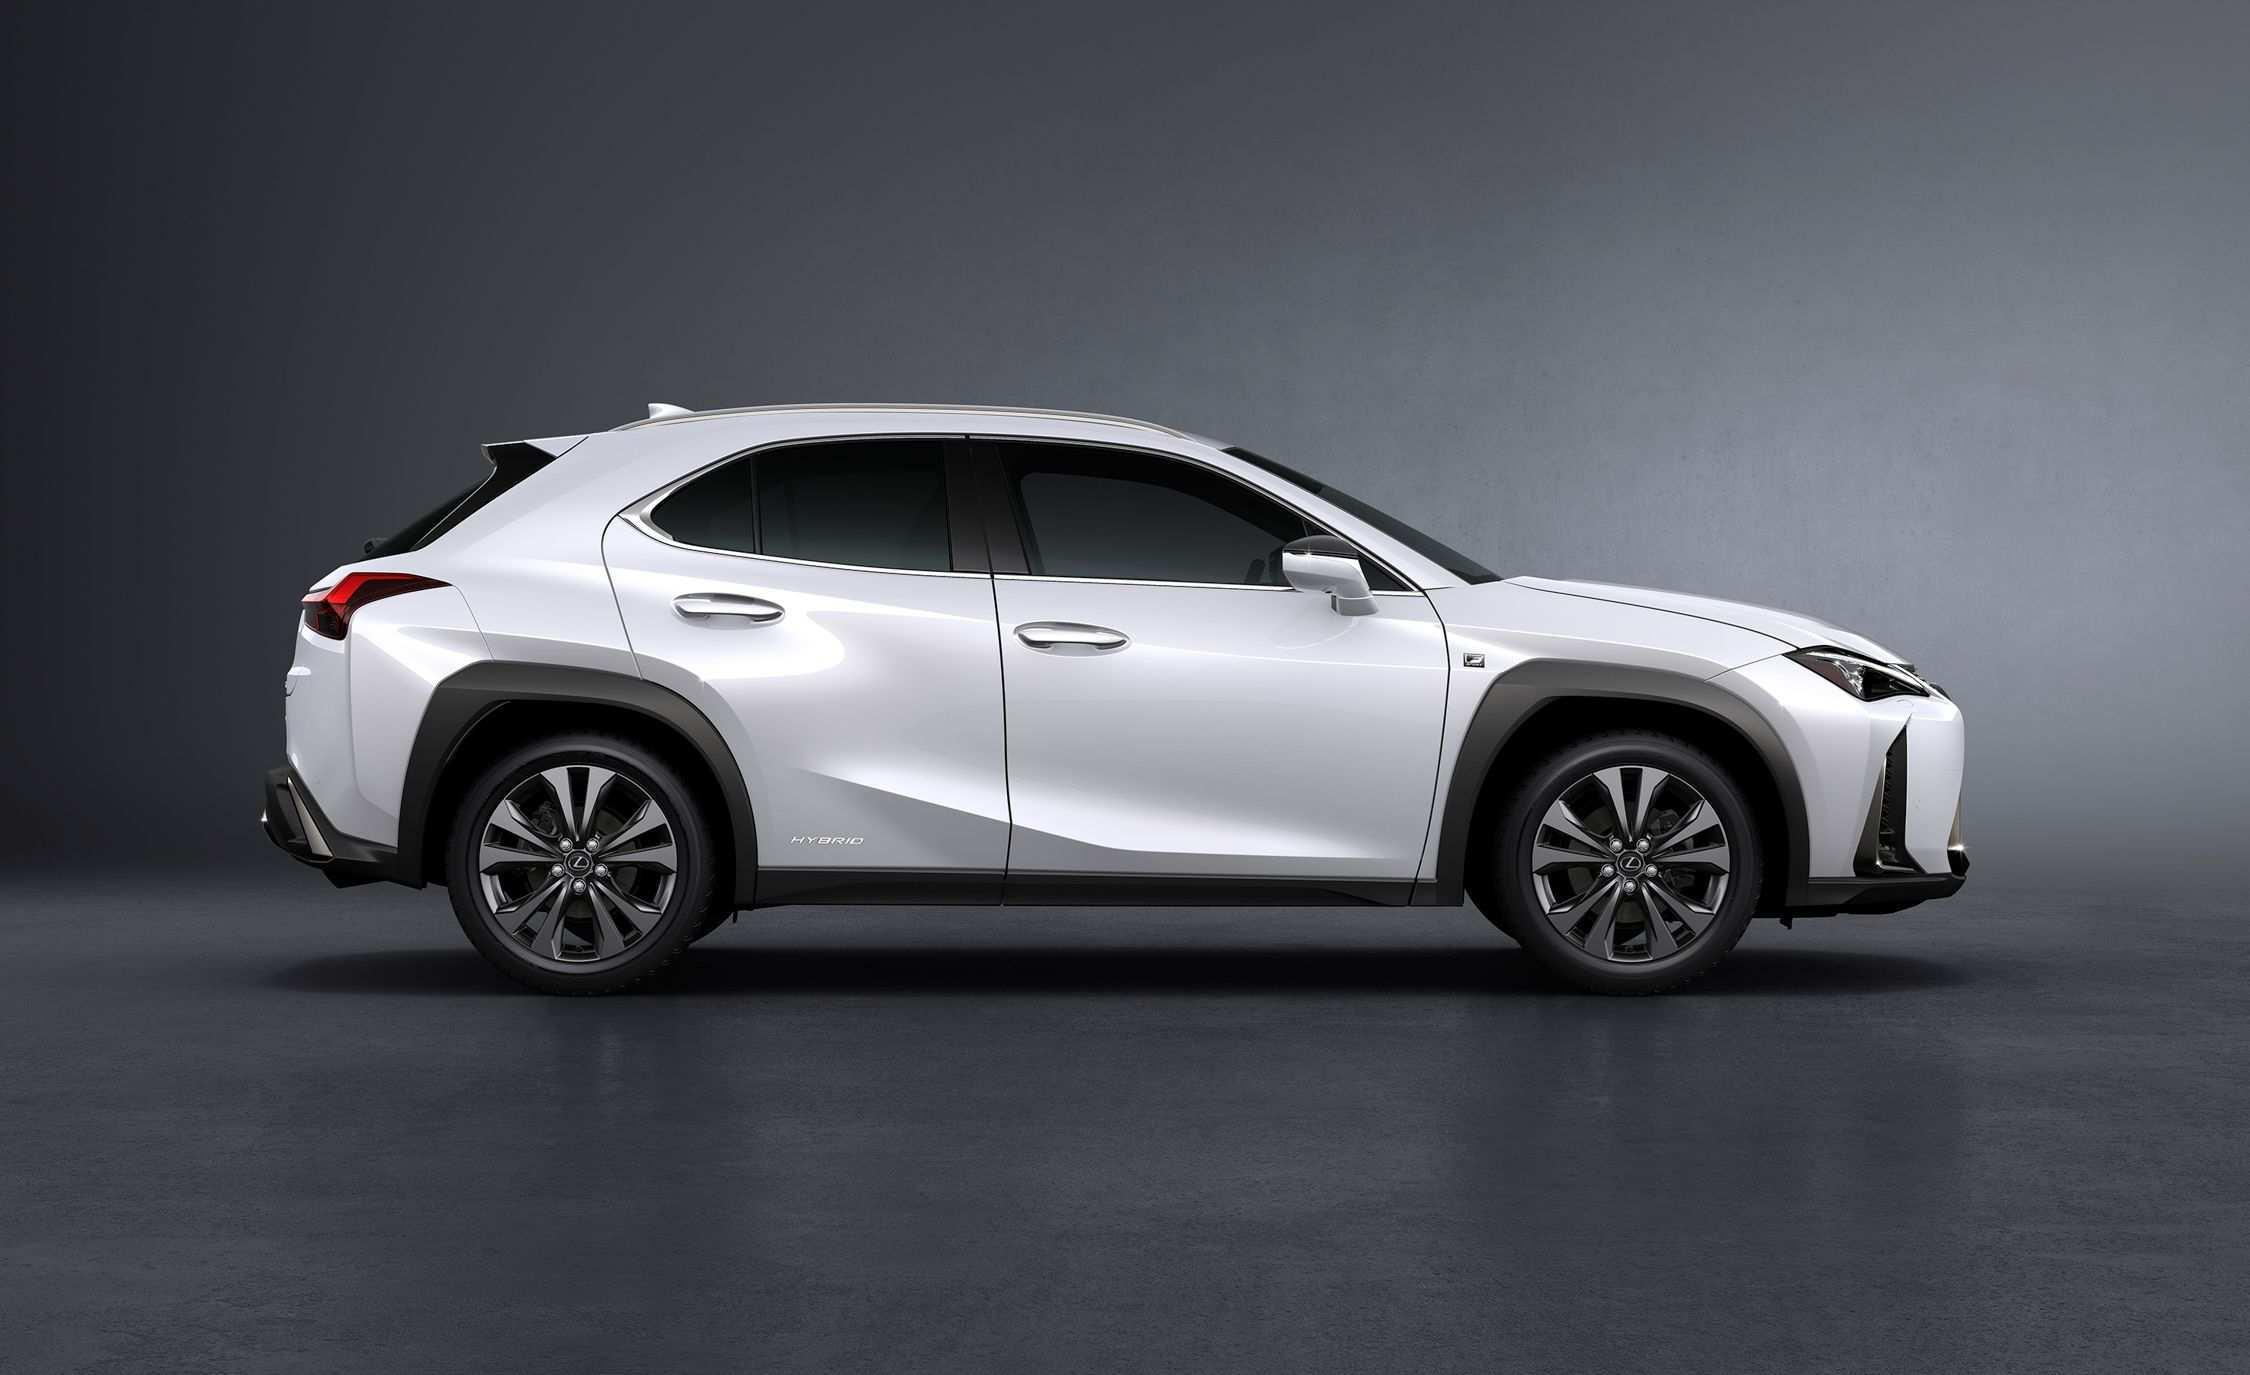 96 Great 2019 Lexus Ux Hybrid Specs by 2019 Lexus Ux Hybrid